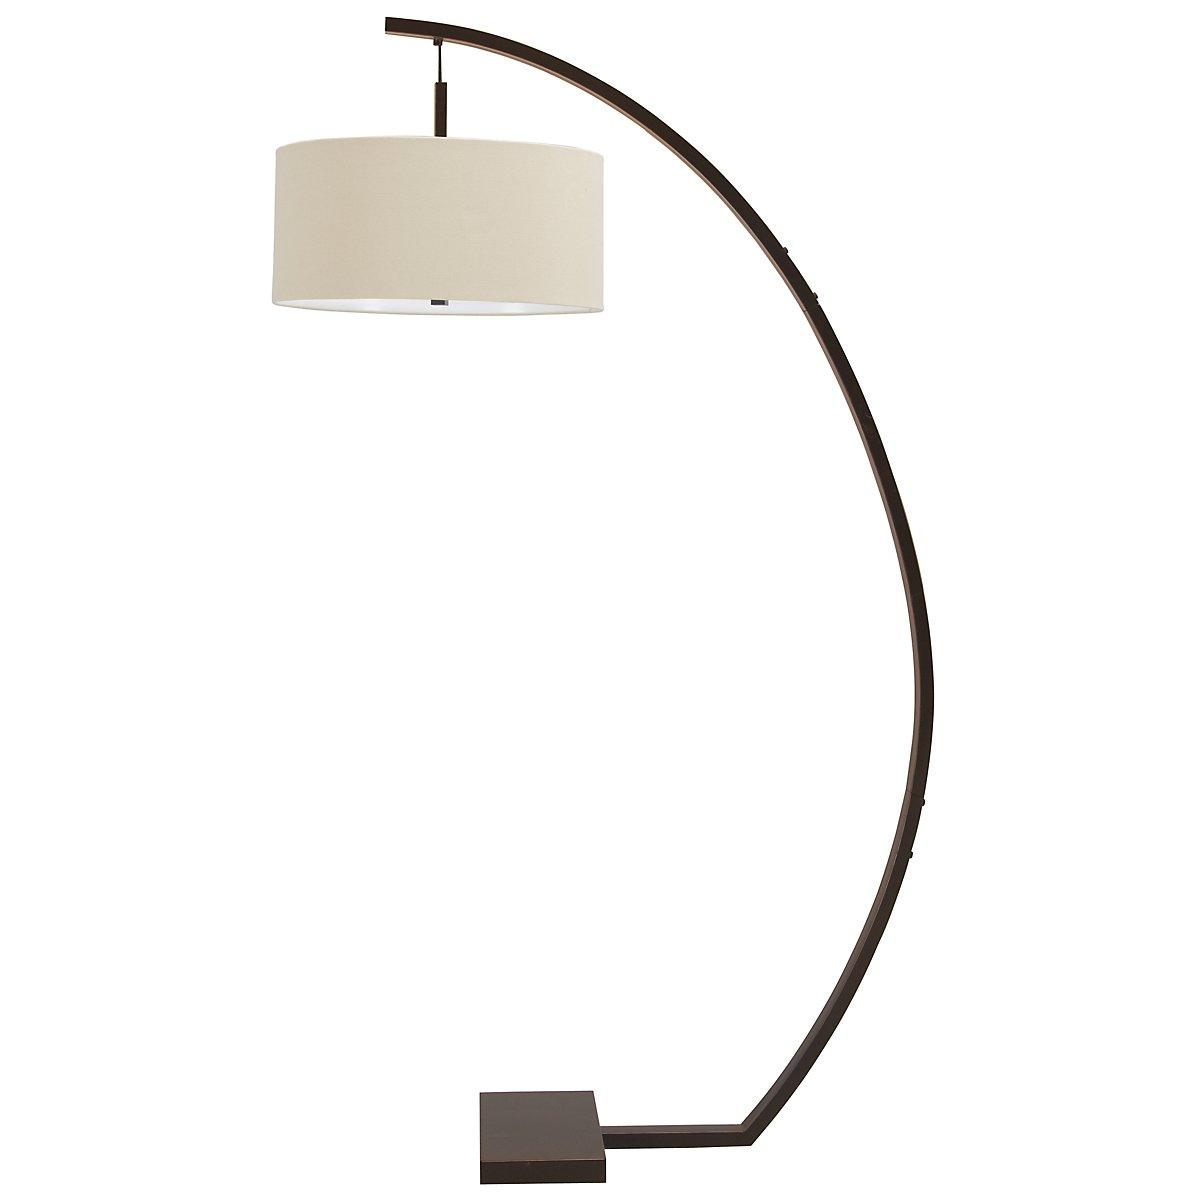 city furniture hanson bronze arc floor lamp. Black Bedroom Furniture Sets. Home Design Ideas